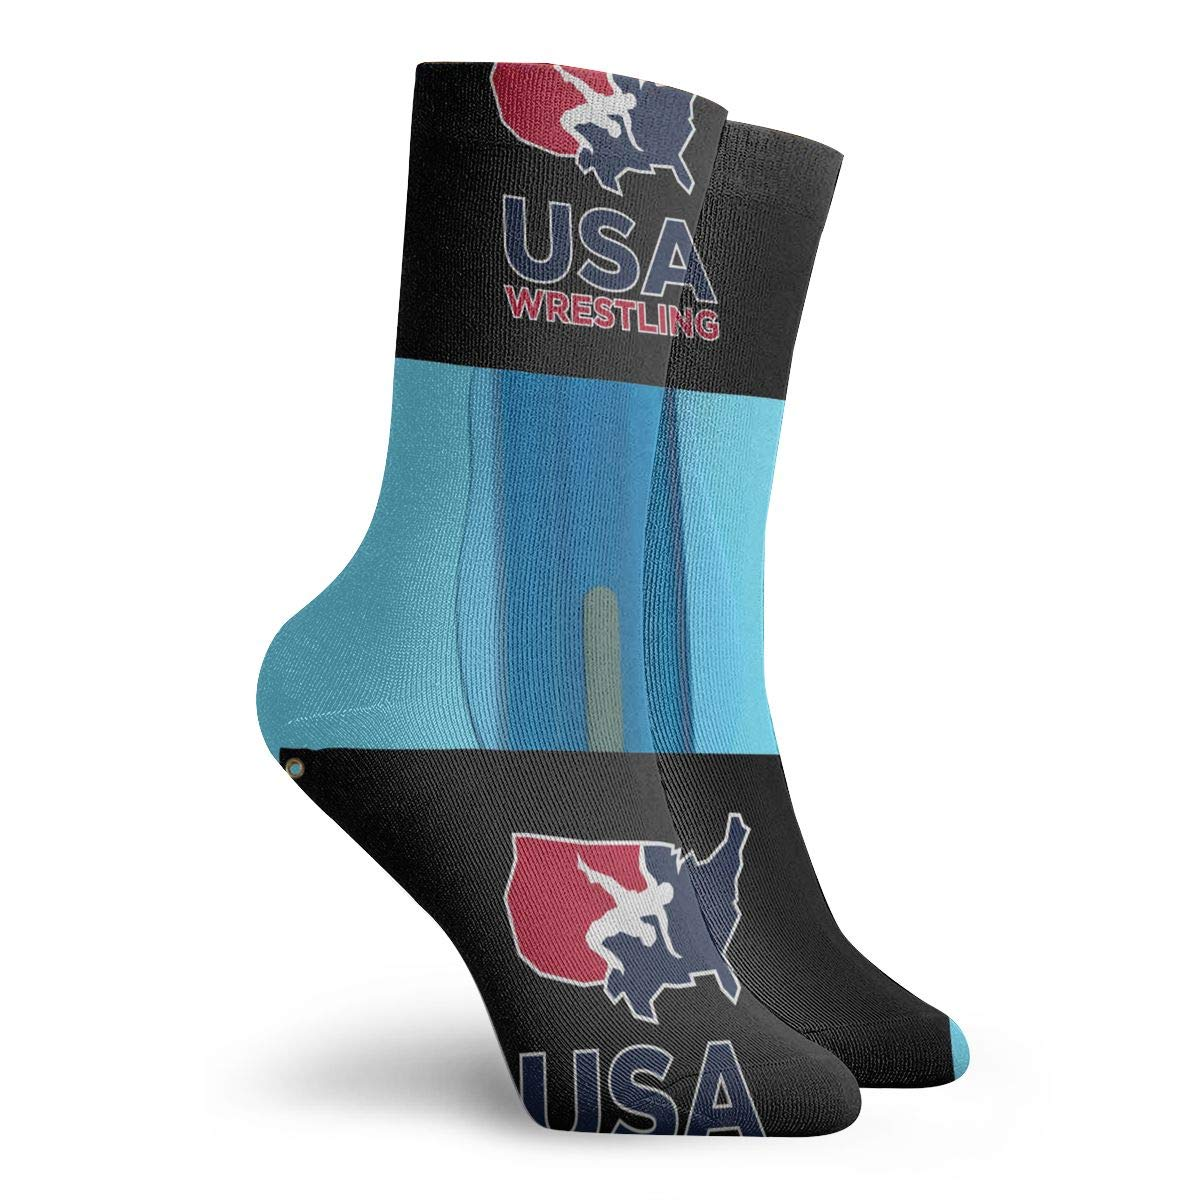 USA Flag Wrestling Fashion Dress Socks Short Socks Leisure Travel 11.8 Inch